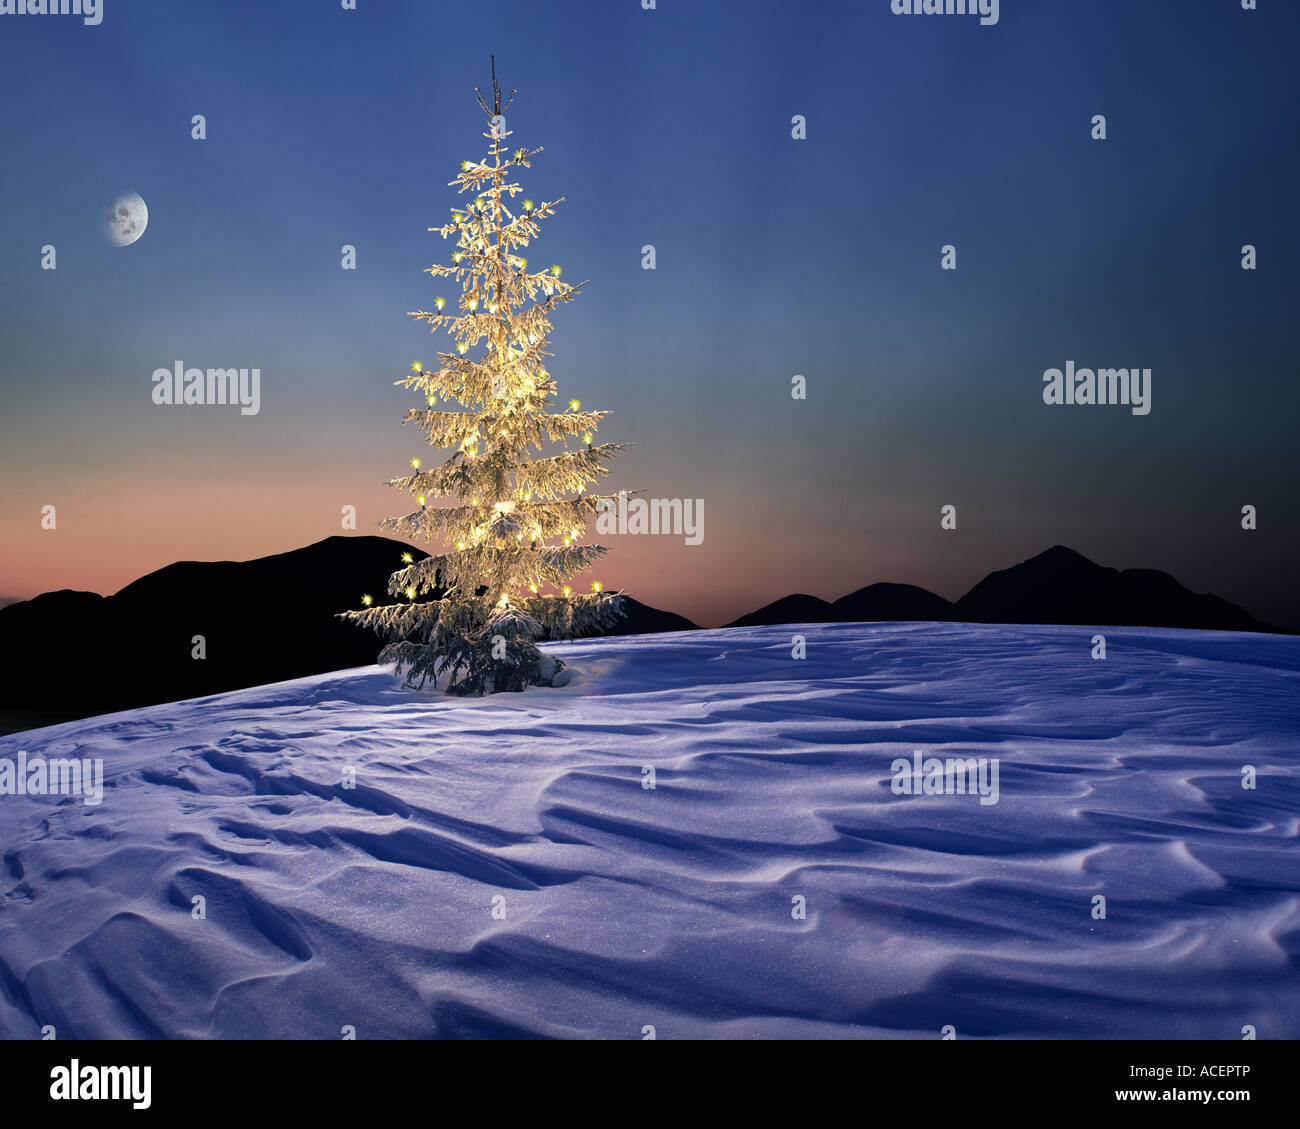 CH - ENGADIN: Alpine escena navideña Imagen De Stock